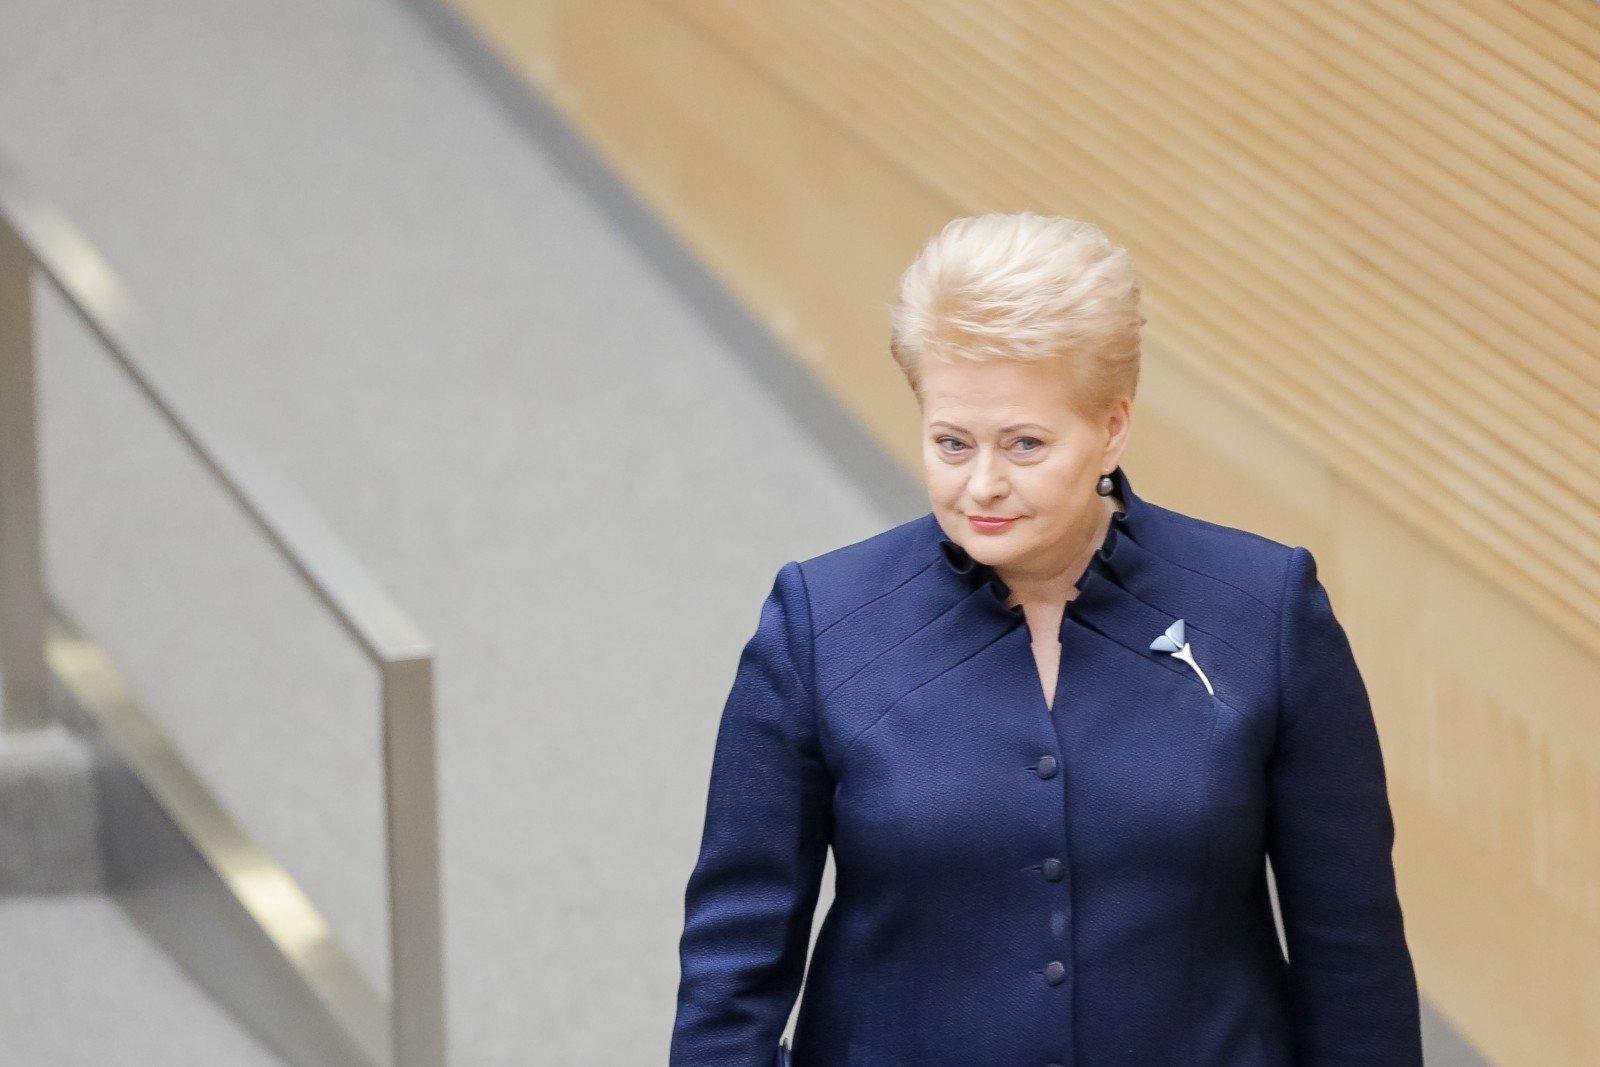 П.Порошенко поздравил Латвию сДнем независимости